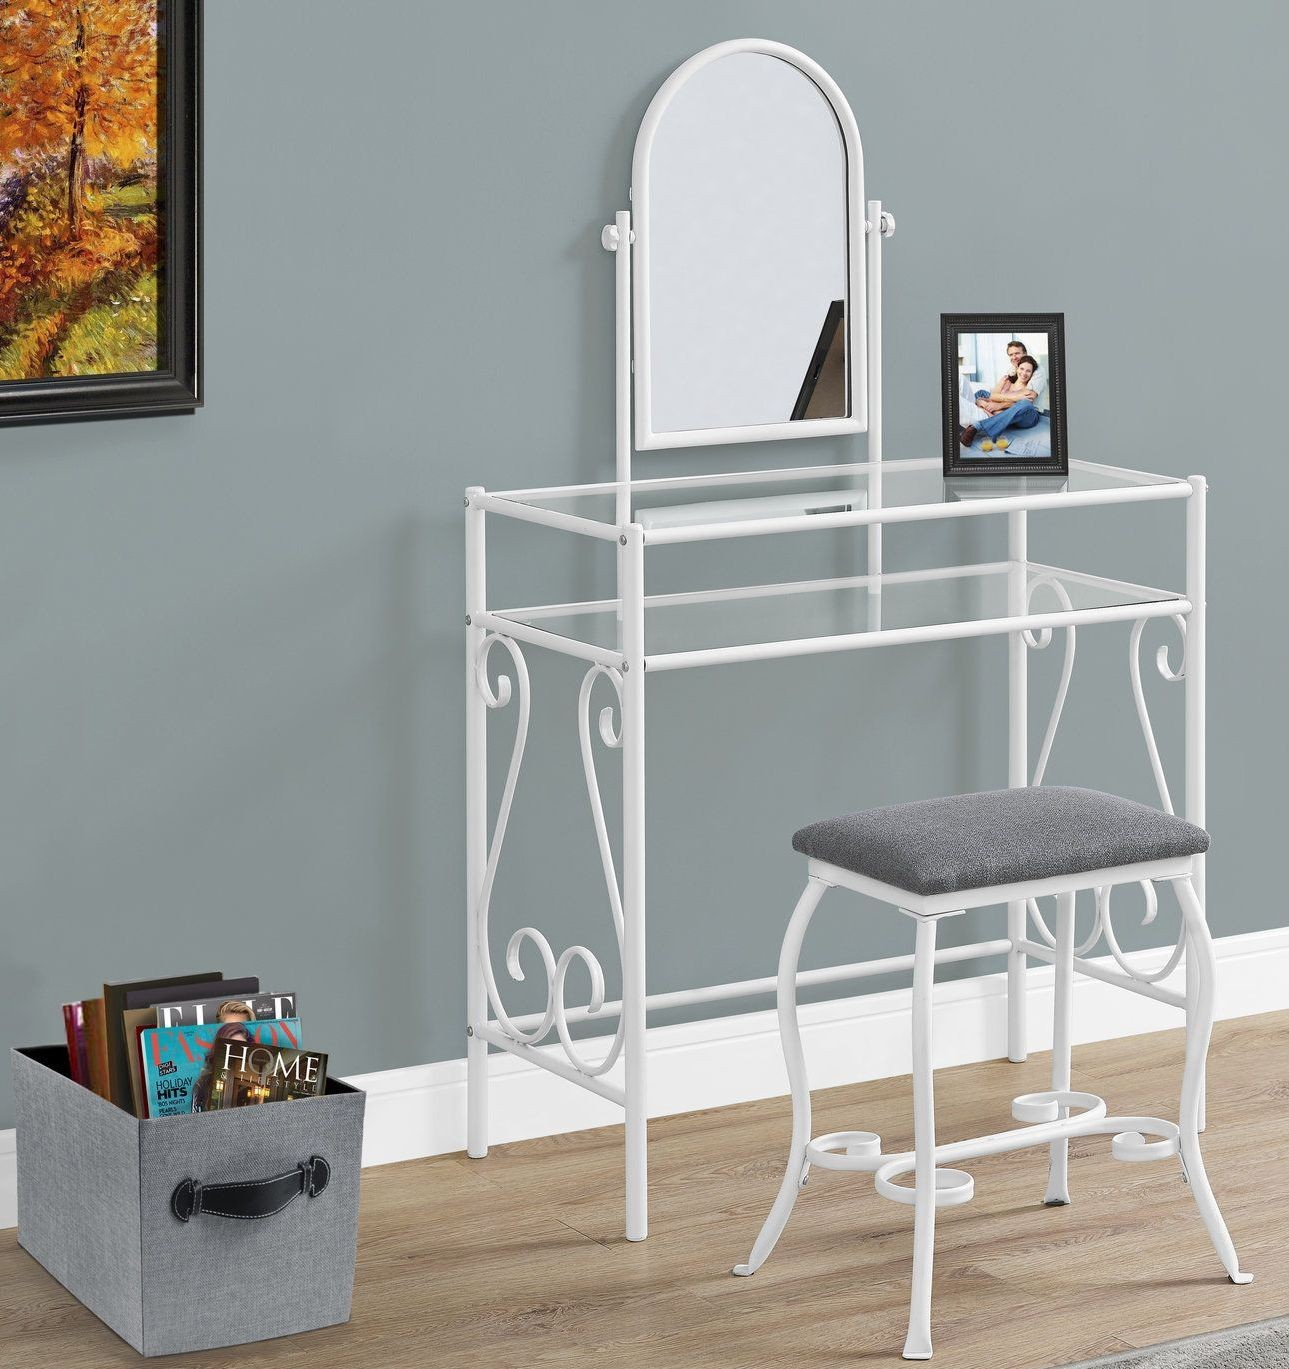 White Metal Vanity SetWhite Metal Vanity Set from Monarch   Coleman Furniture. White Metal Vanity Set. Home Design Ideas